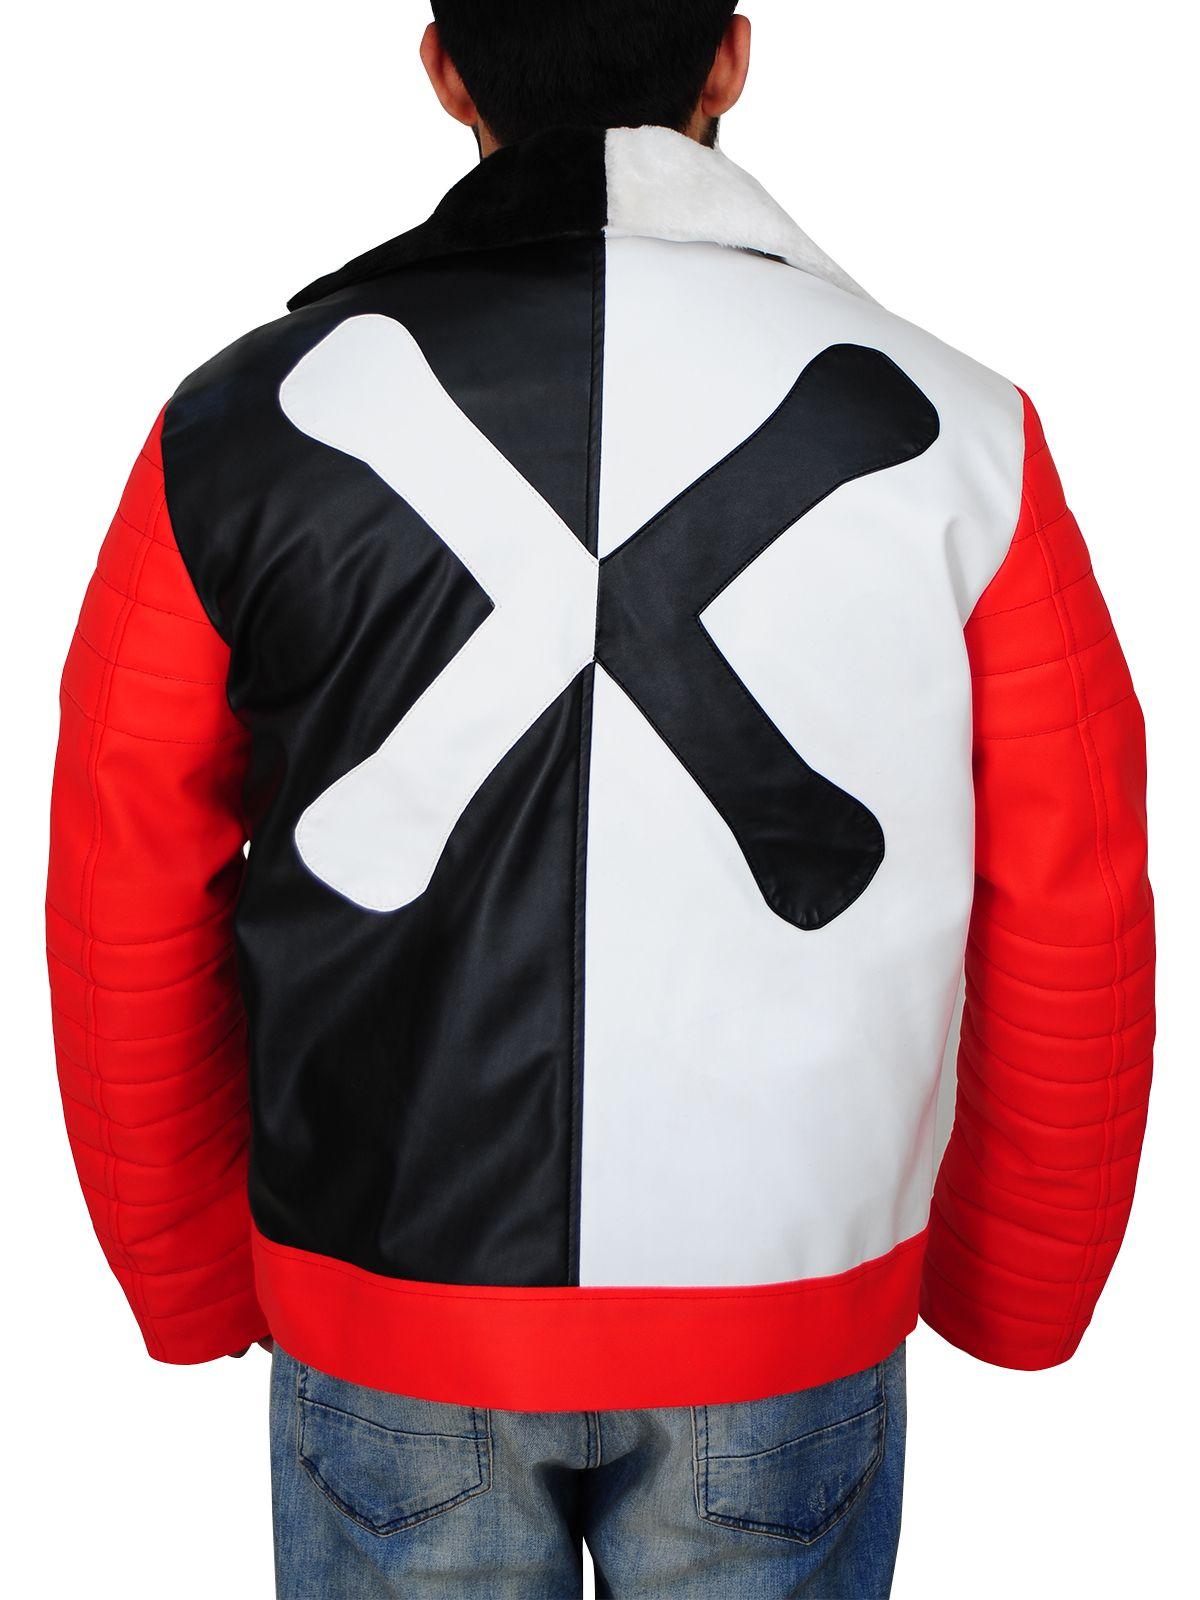 Removable Arms Distressed Carlos Cameron Boyce Descendants 2 Double Rider Jacket